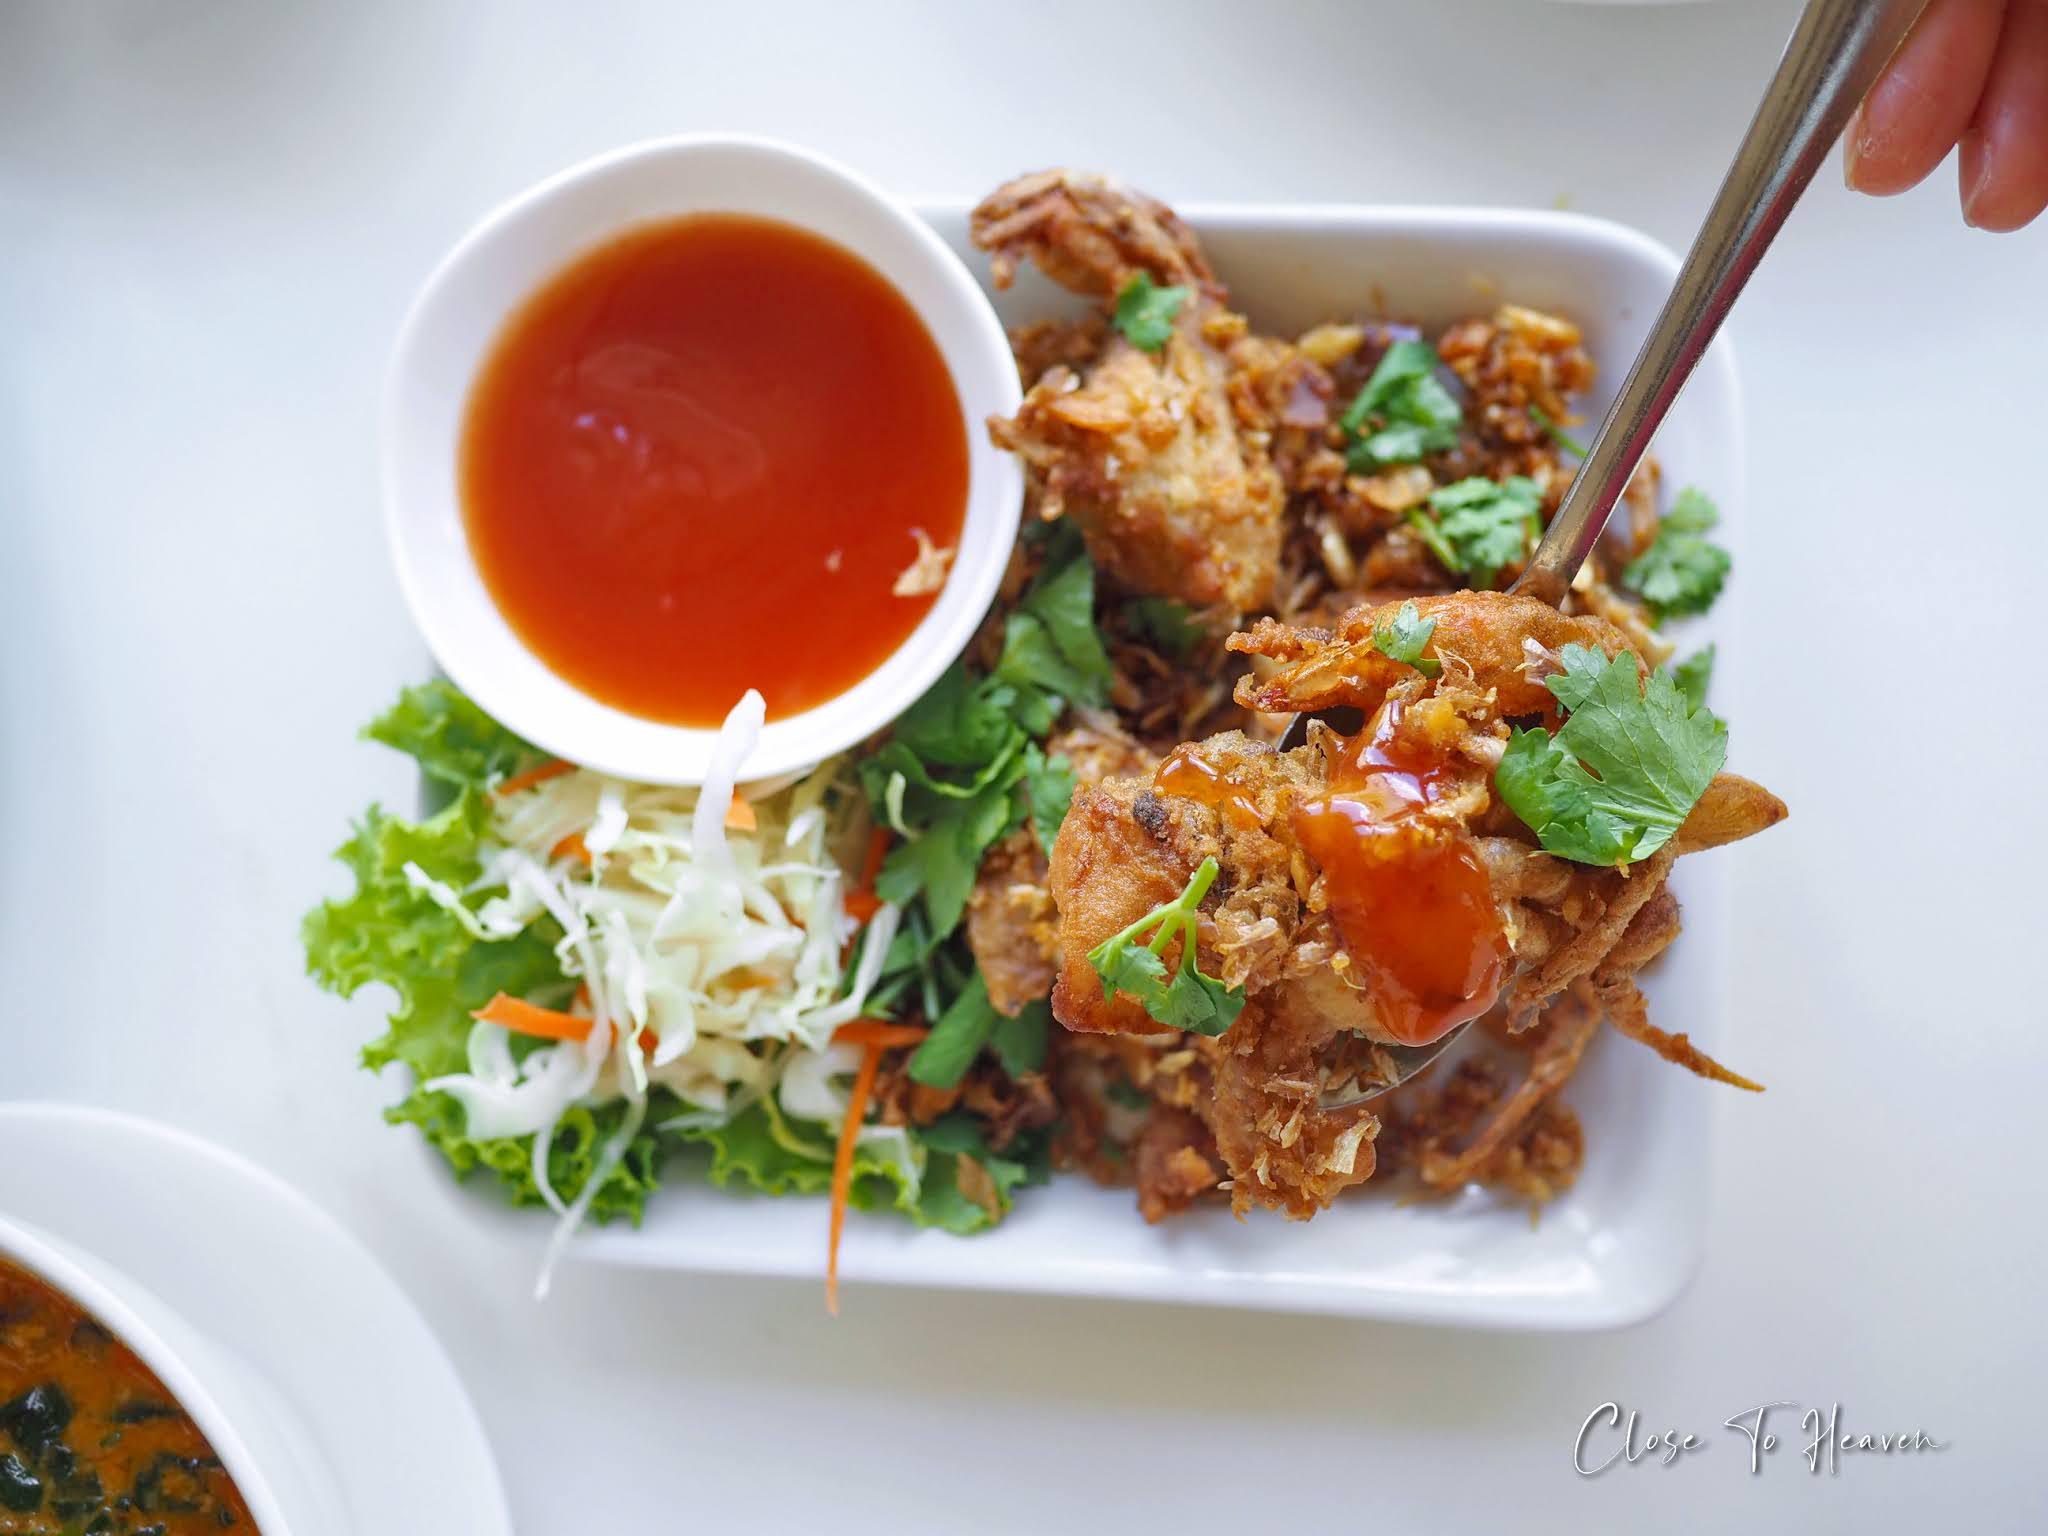 Mae-la Kitchen แม่ลาคิทเช่น เมืองทองธานี แจ้งวัฒนะ